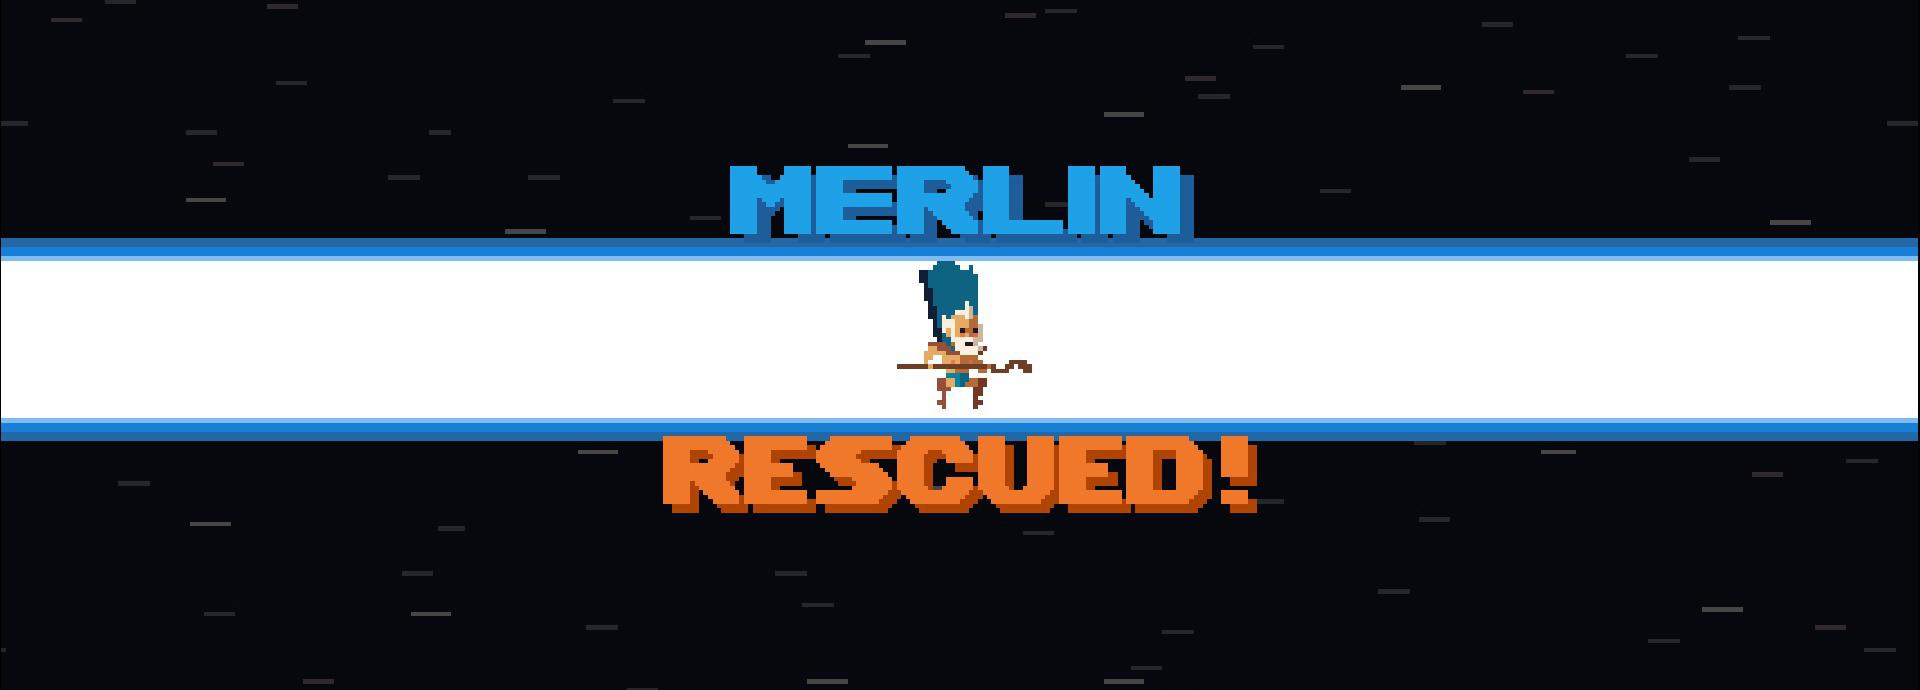 STF merlin